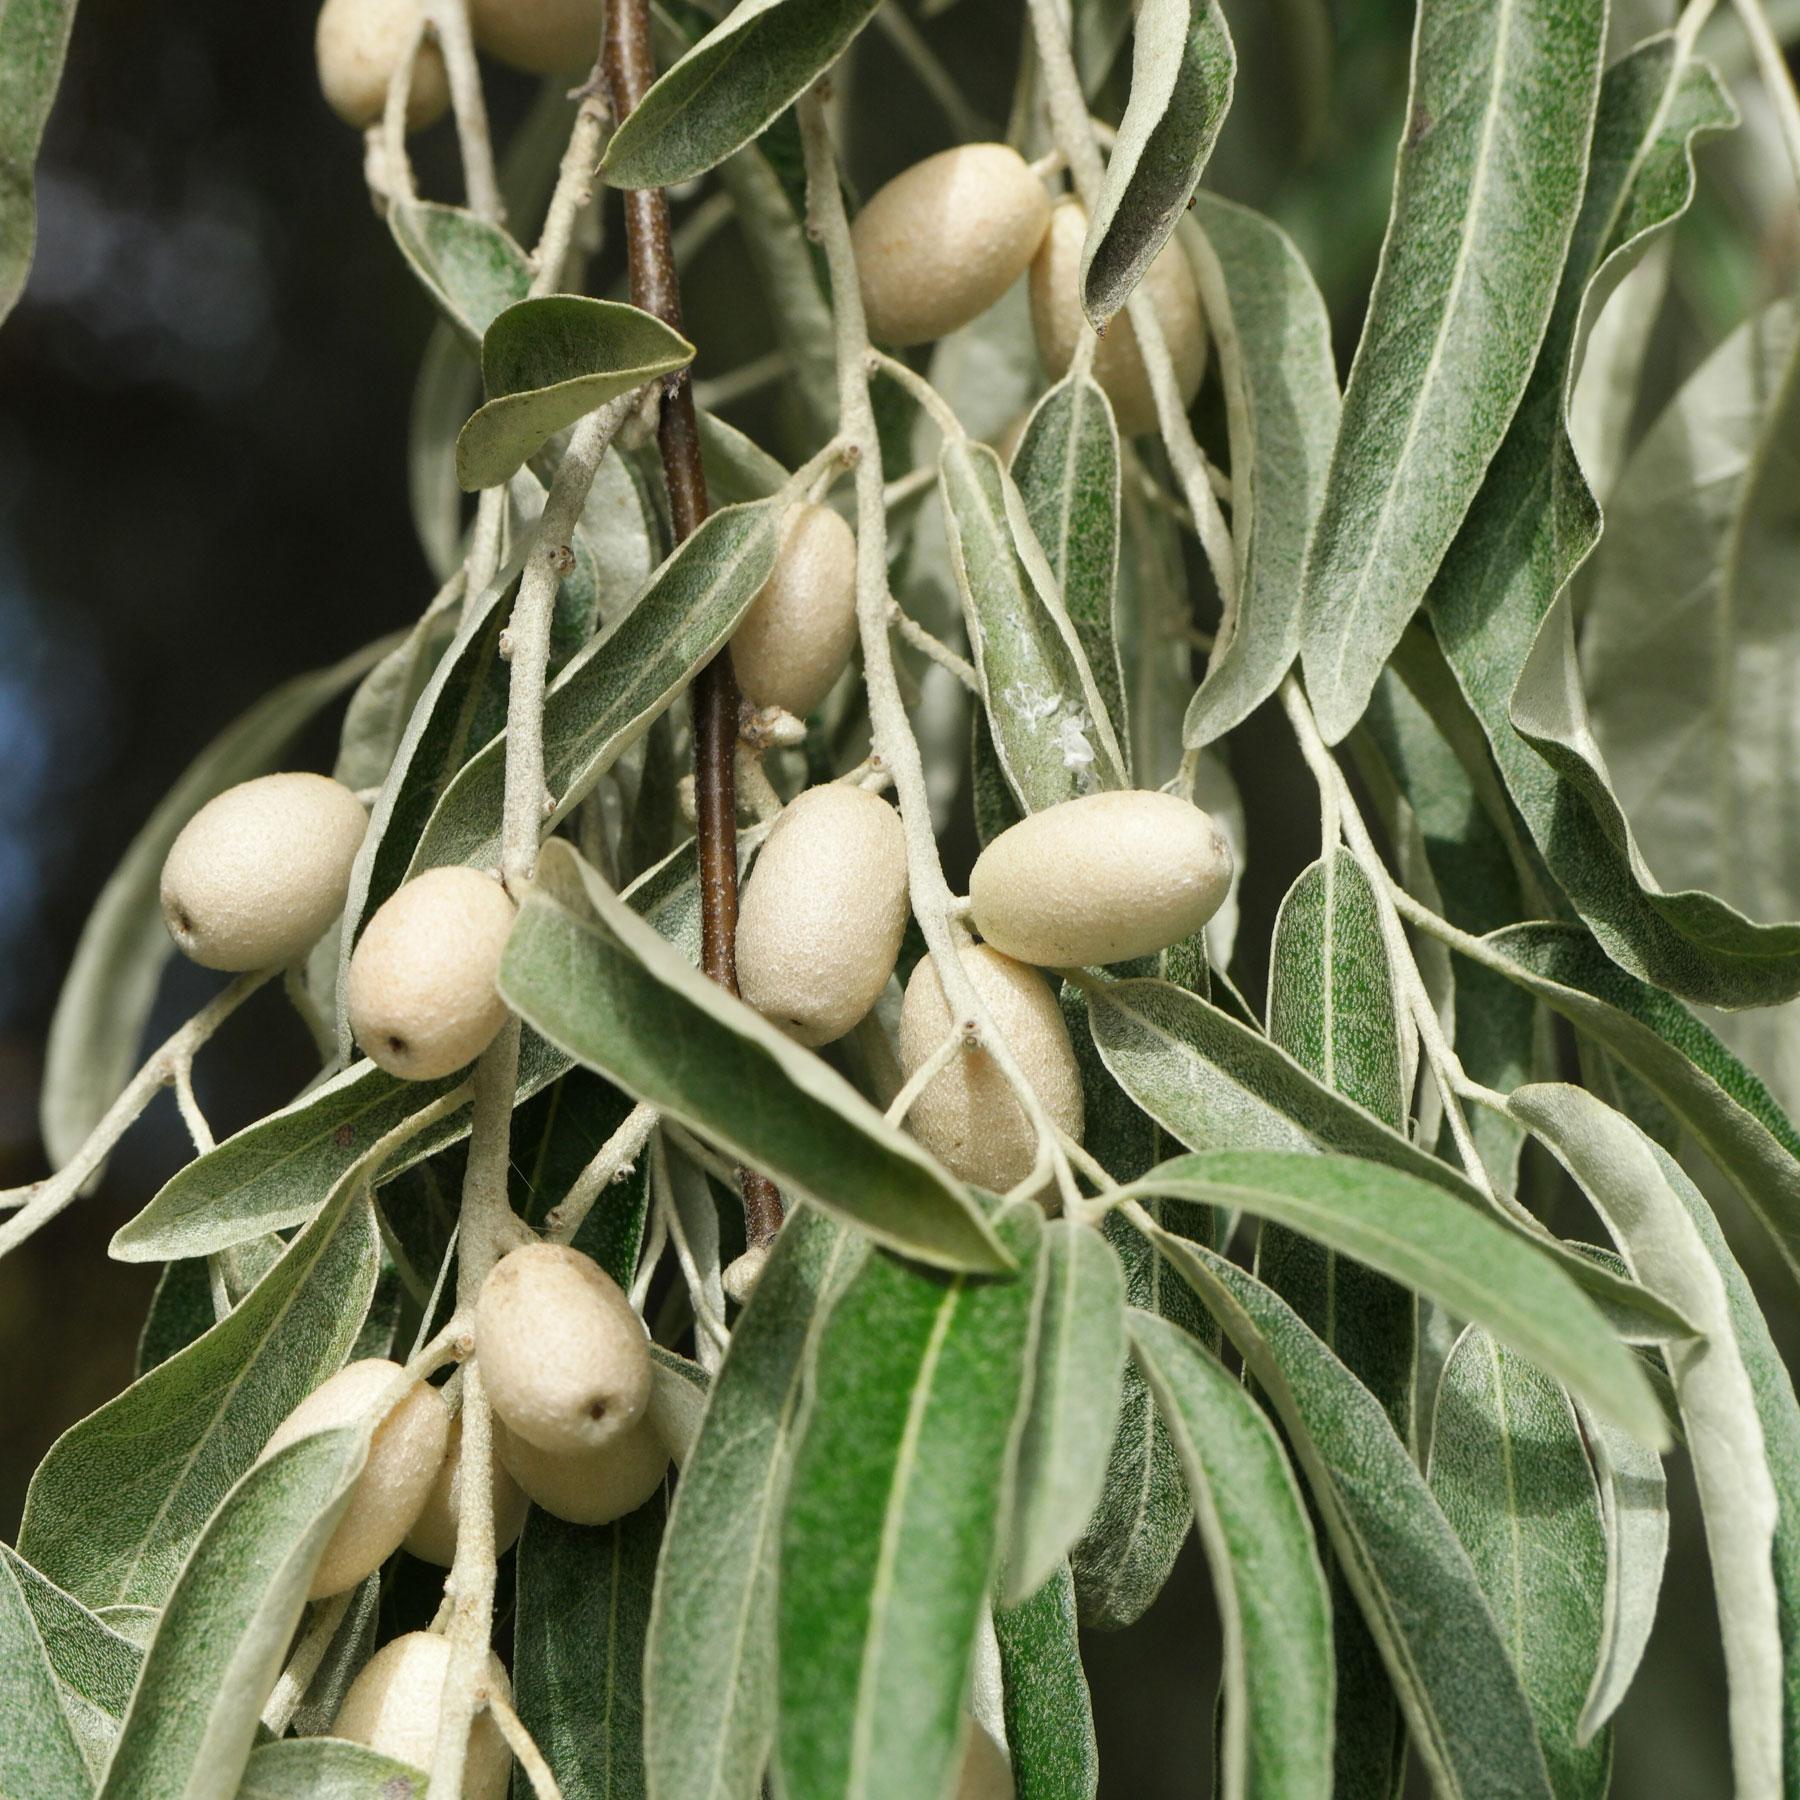 Schmalblättrige Ölweide Beeren